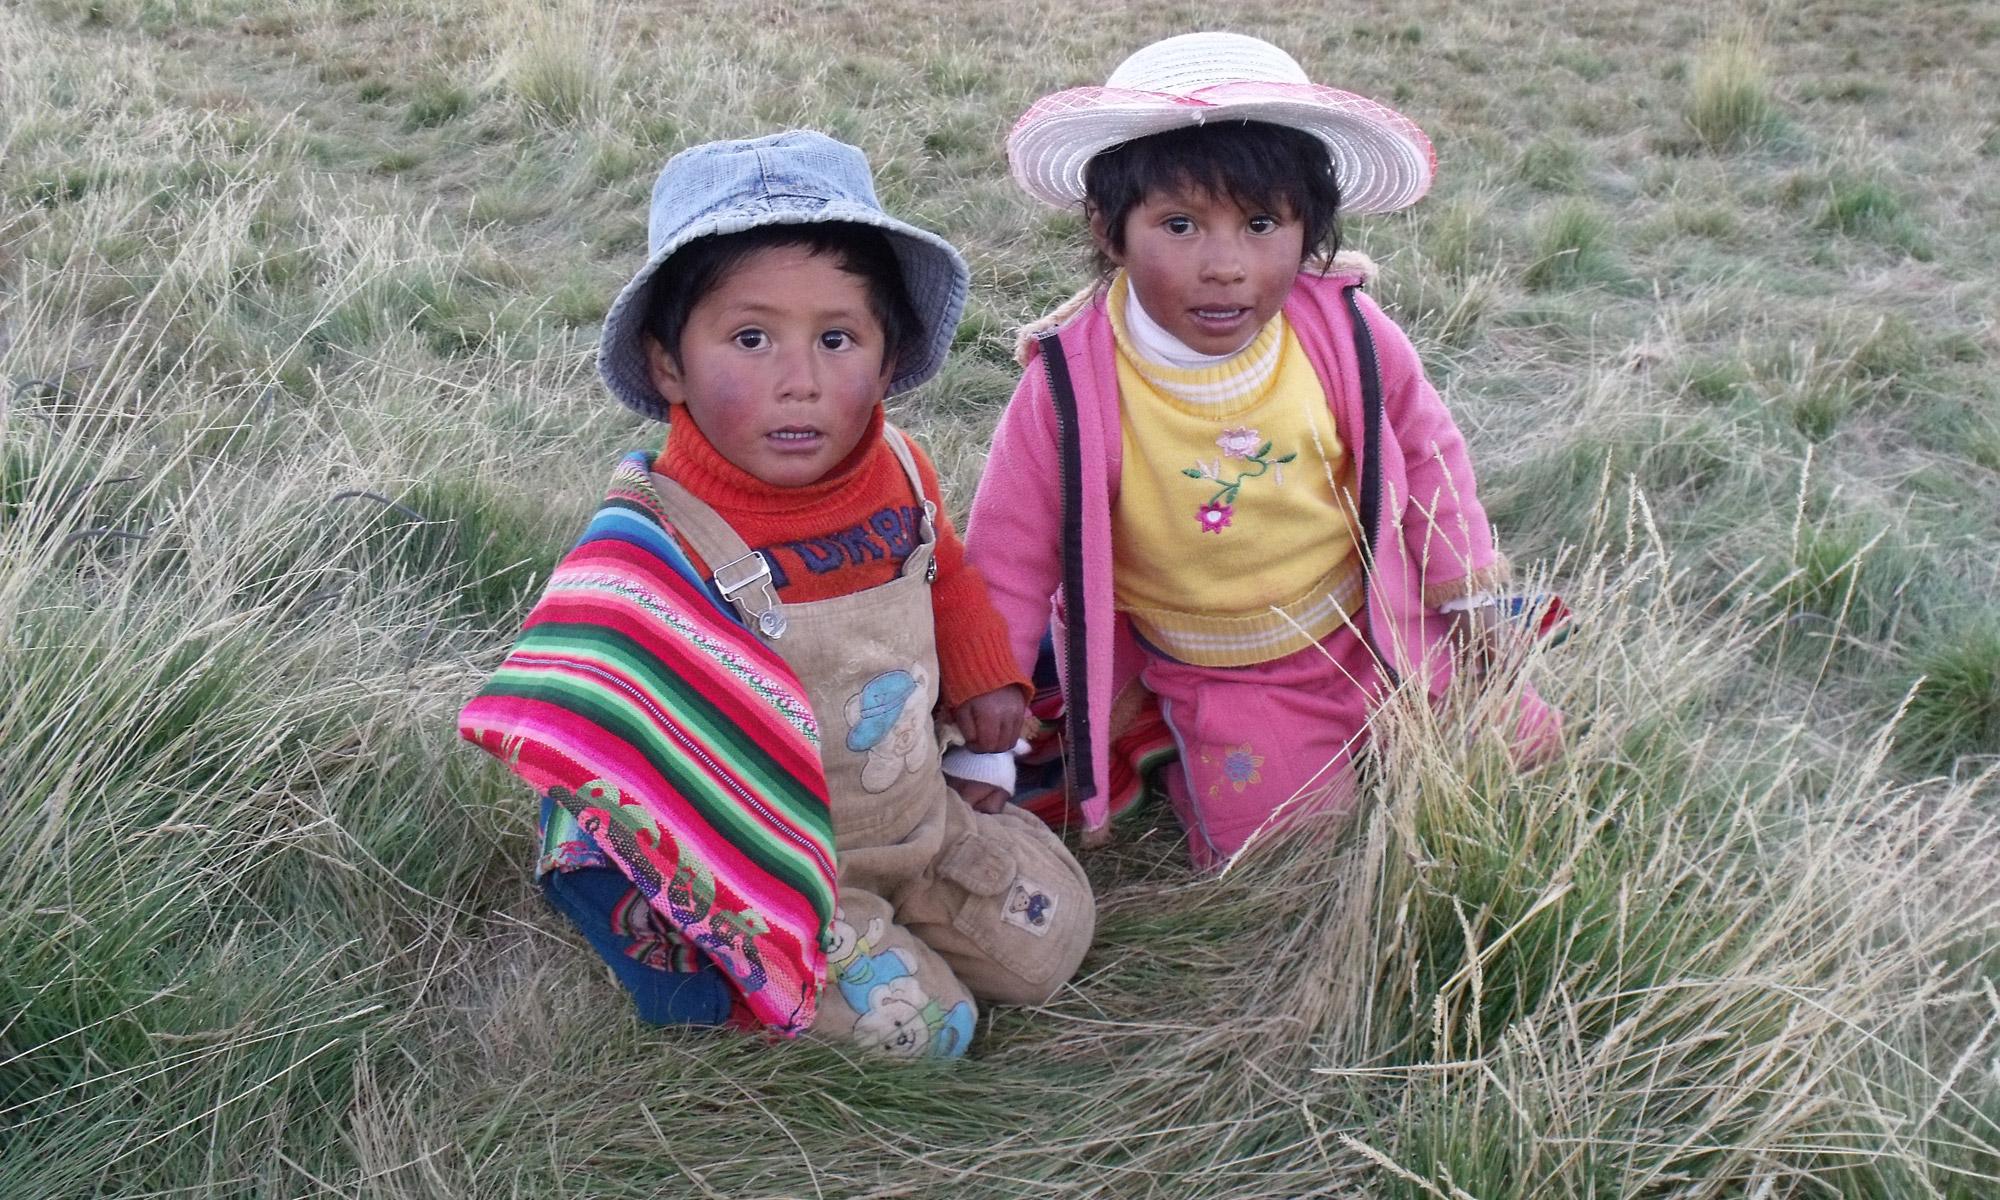 Aktion Peruhilfe e.V.